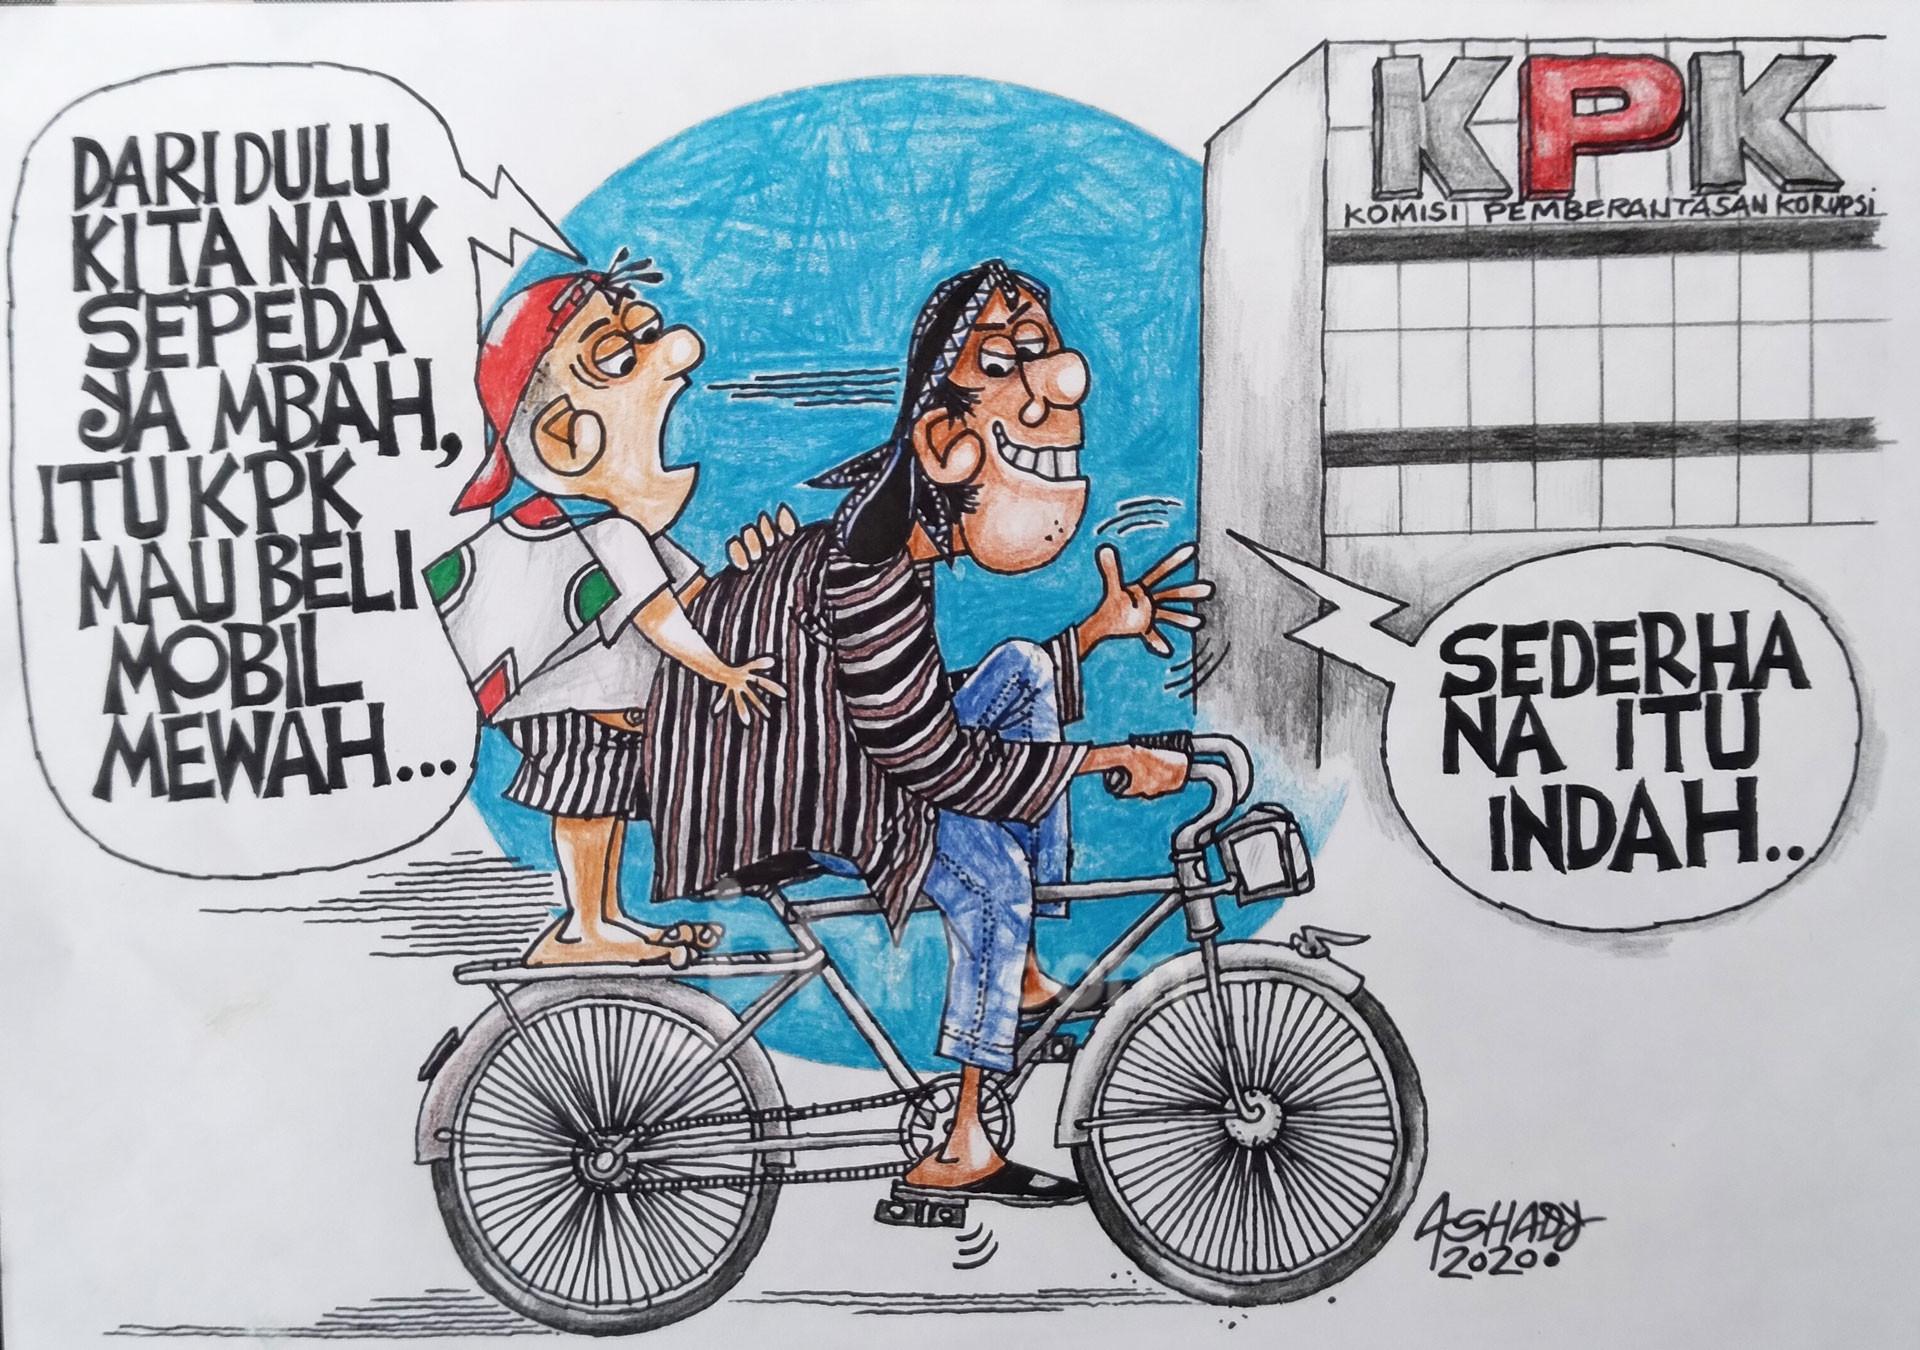 Mobil Mewah Pemberantas Rasuah. Karikatur oleh Ashady - JPNN.com